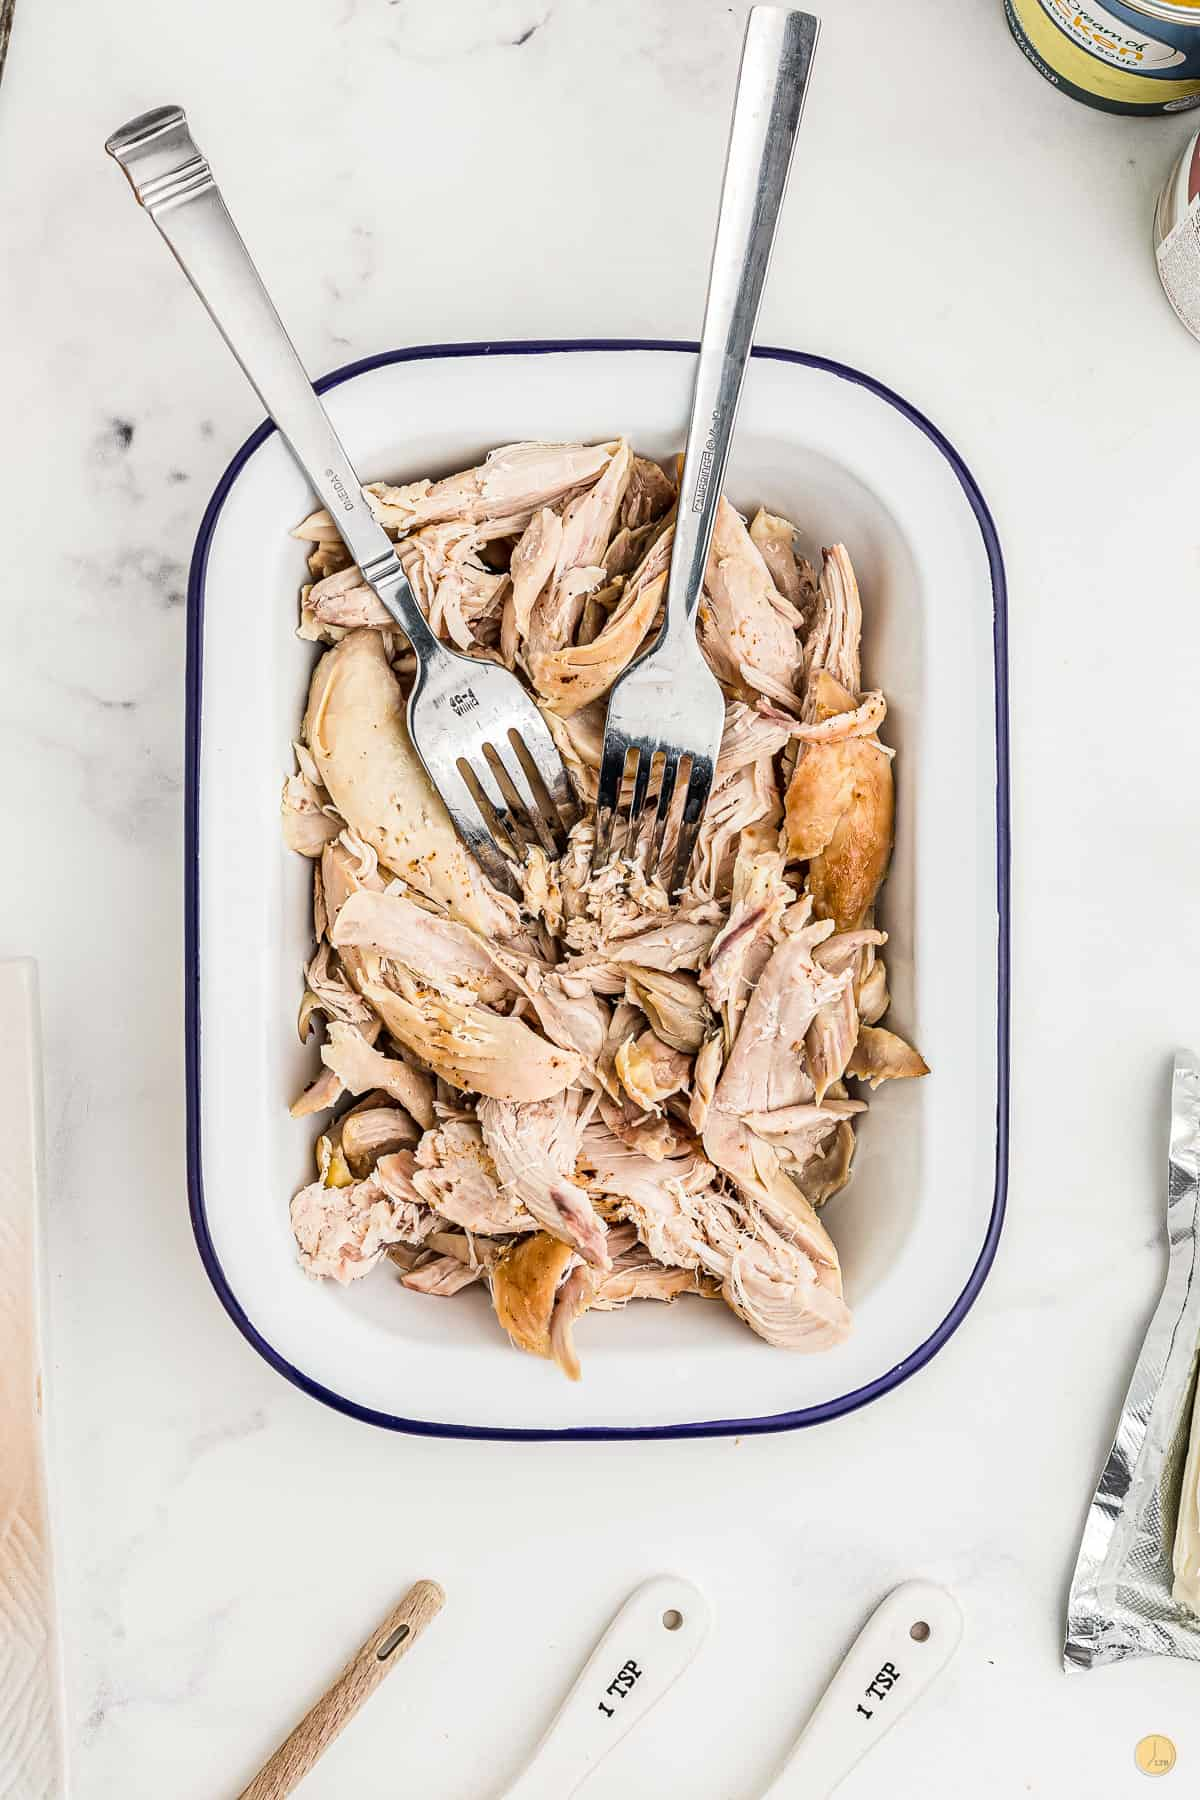 shredded chicken in a dish